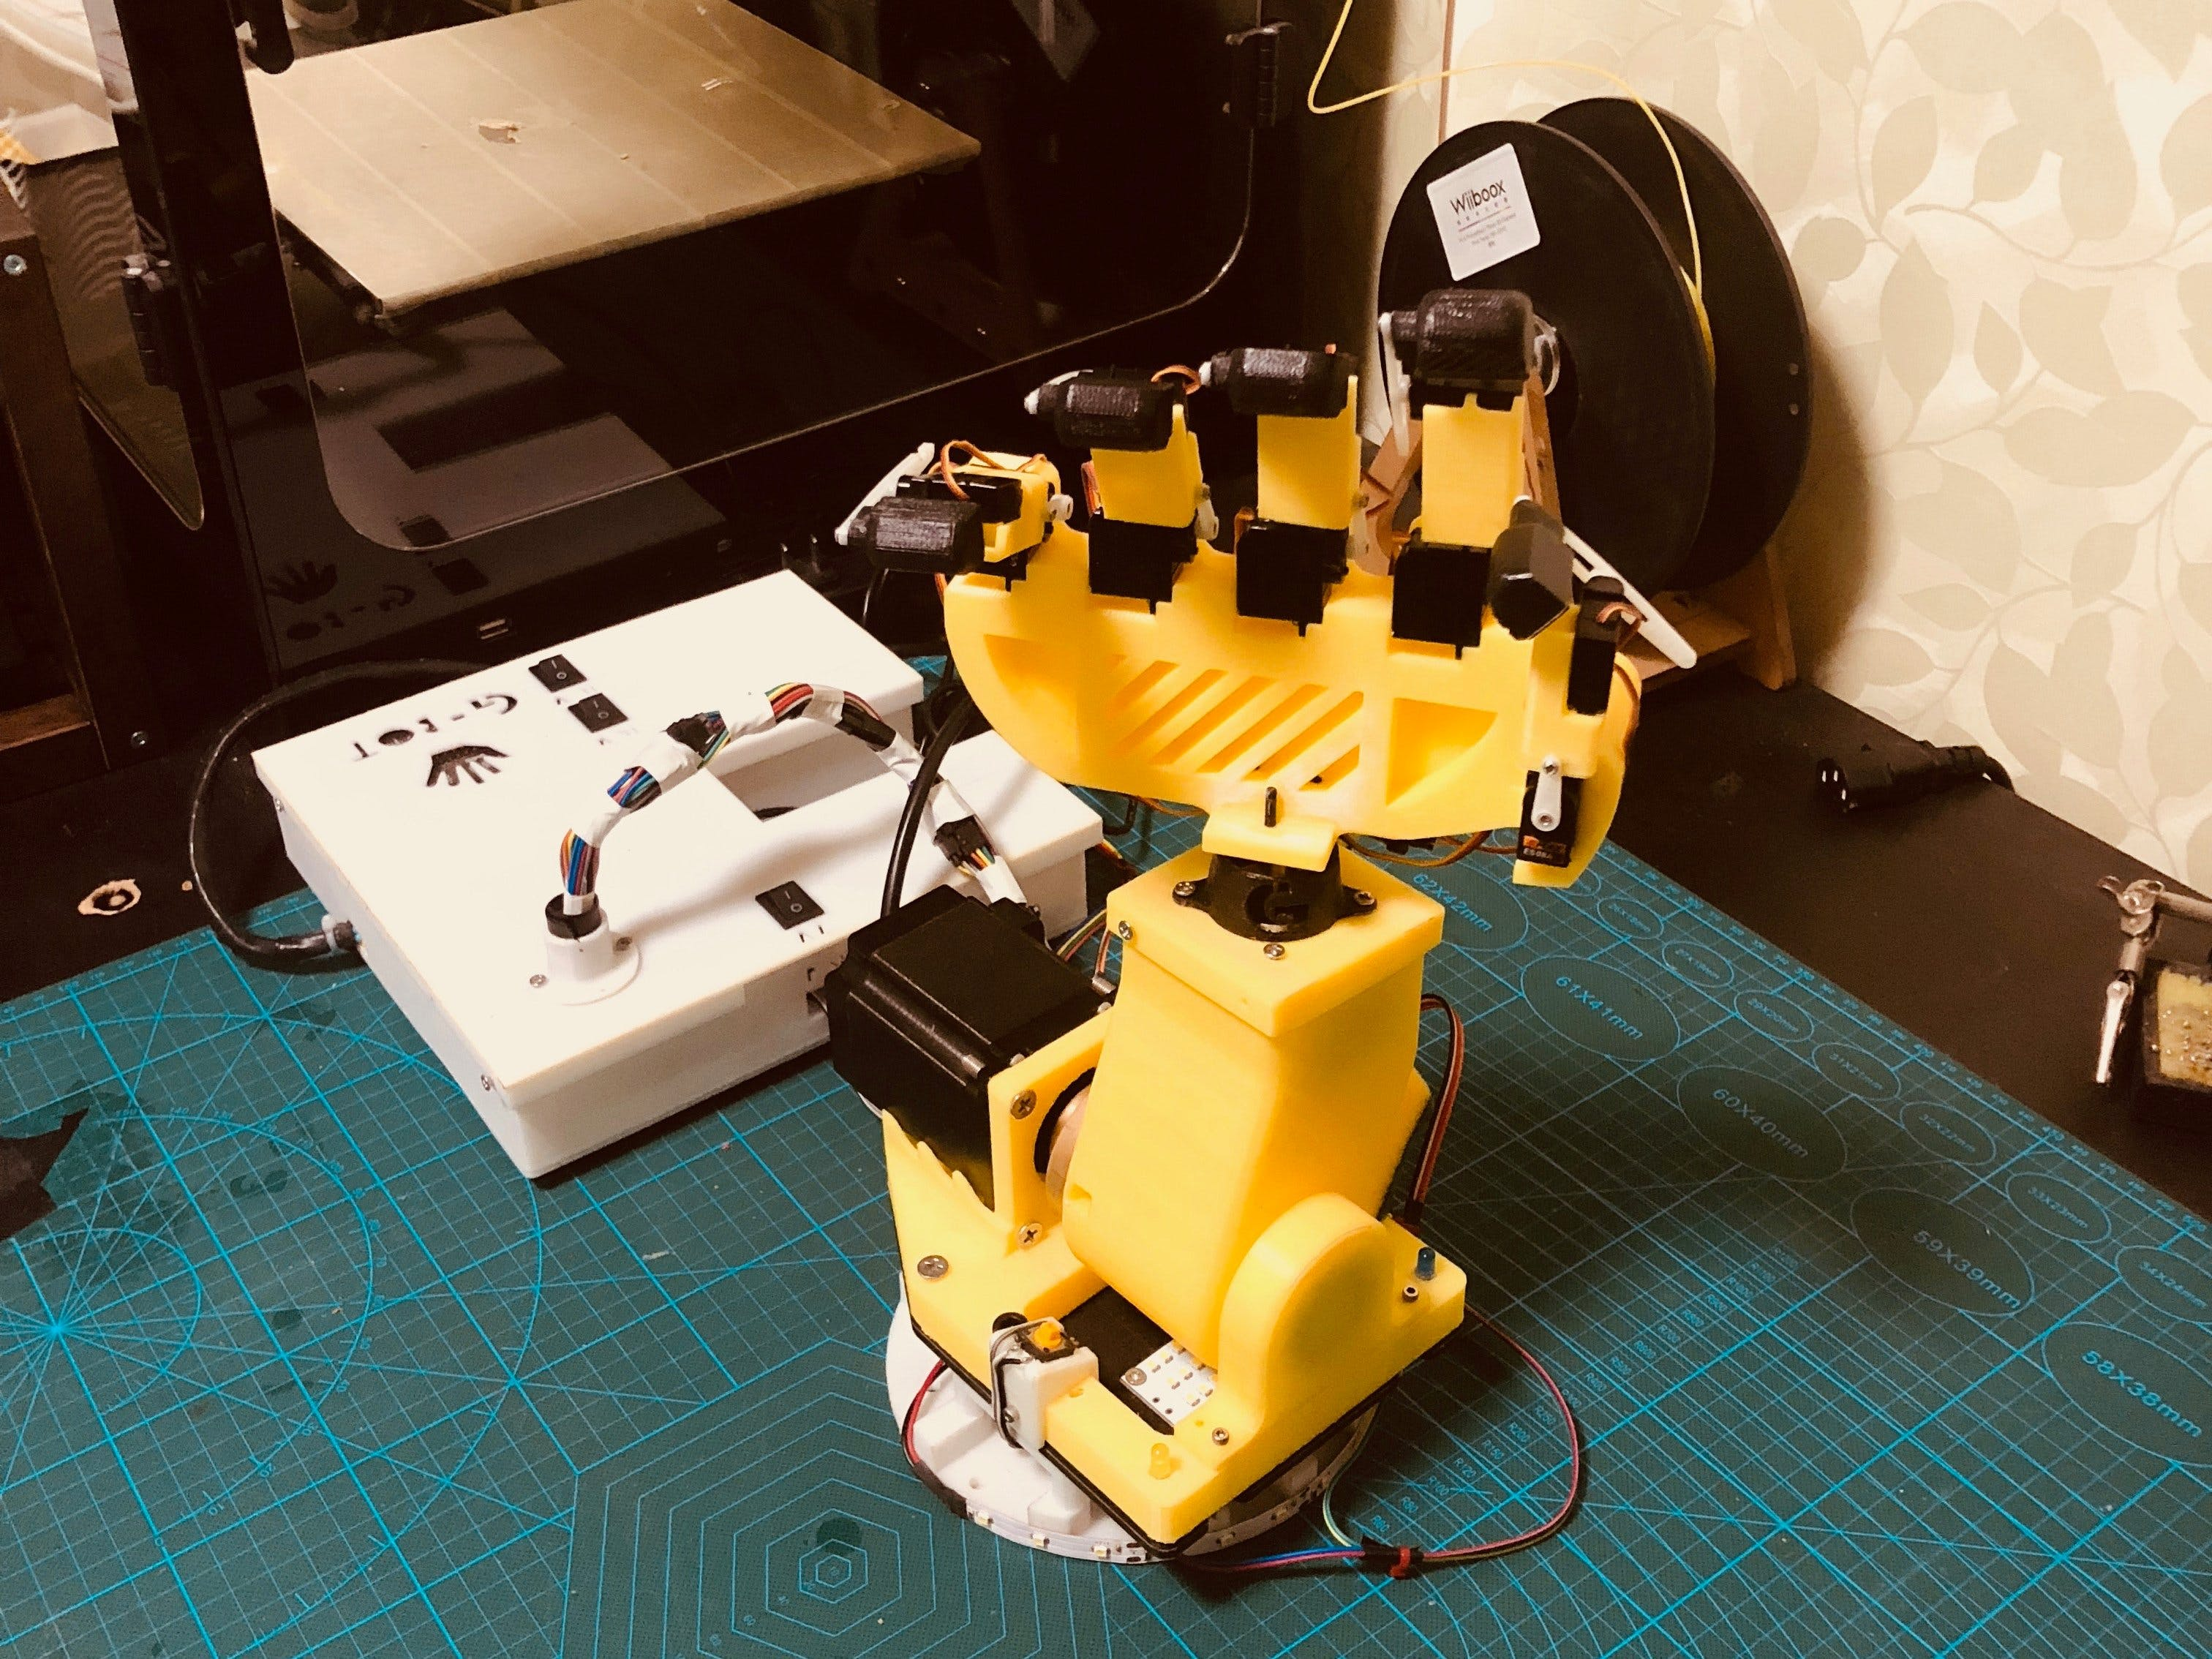 'Gesture Bot' with Hand Gestures